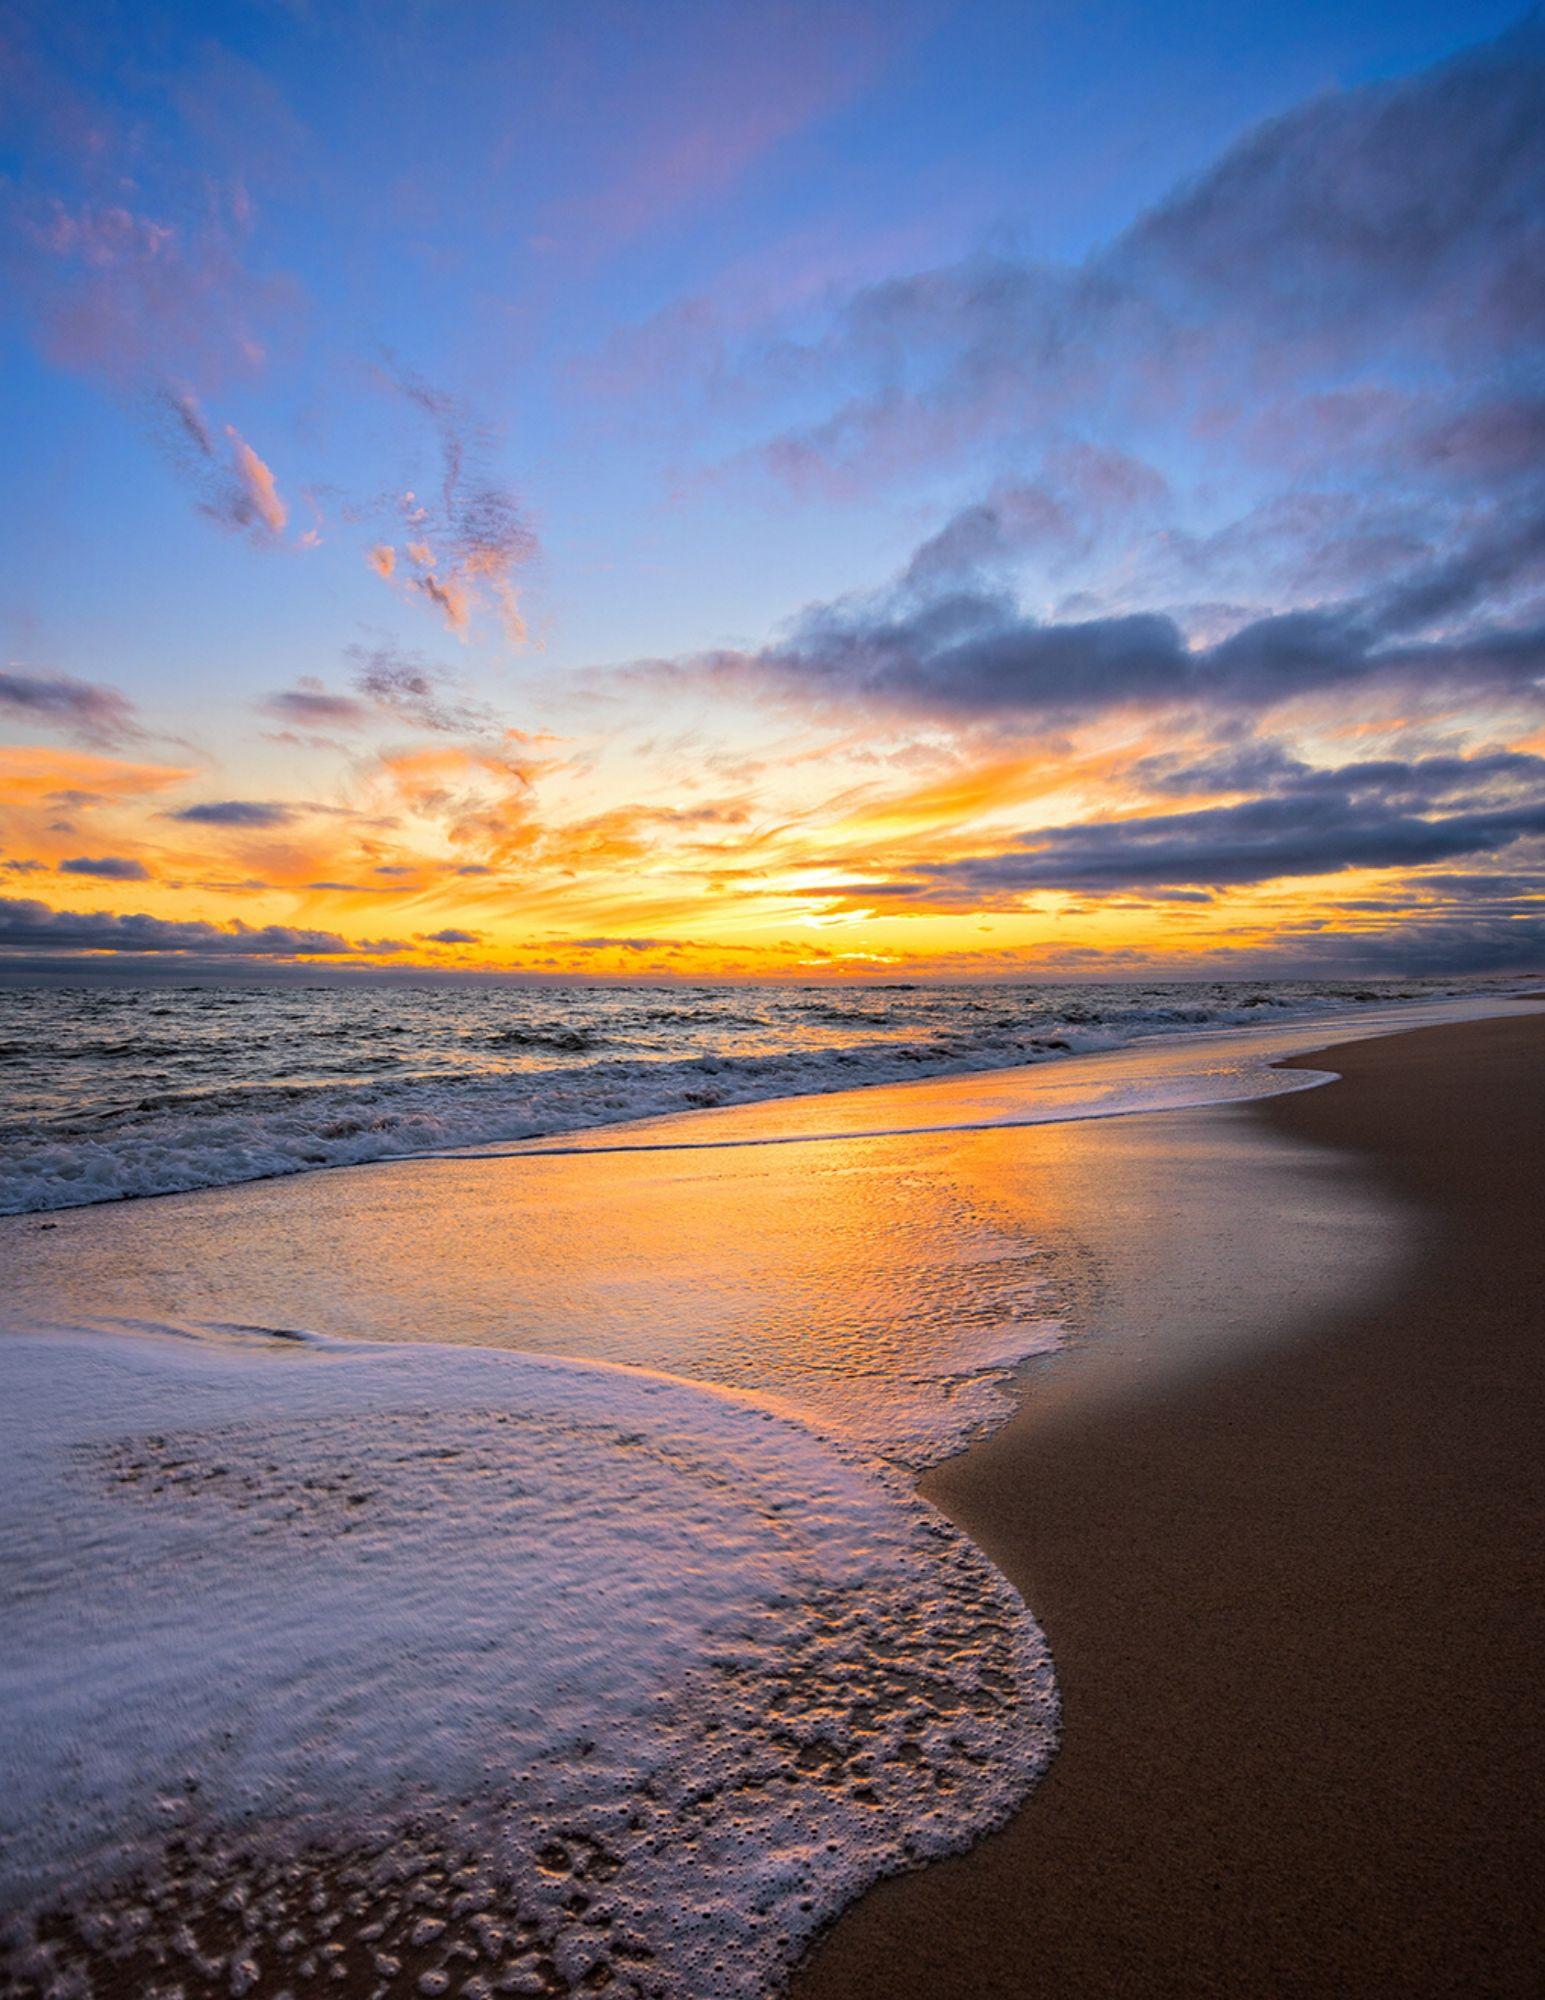 John Montes Jr Photography Best Places to Photograph Sunrise and Sunset on Marthas Vineyard-Best Places to Photograph Sunrise and Sunset on Marthas Vineyard-16